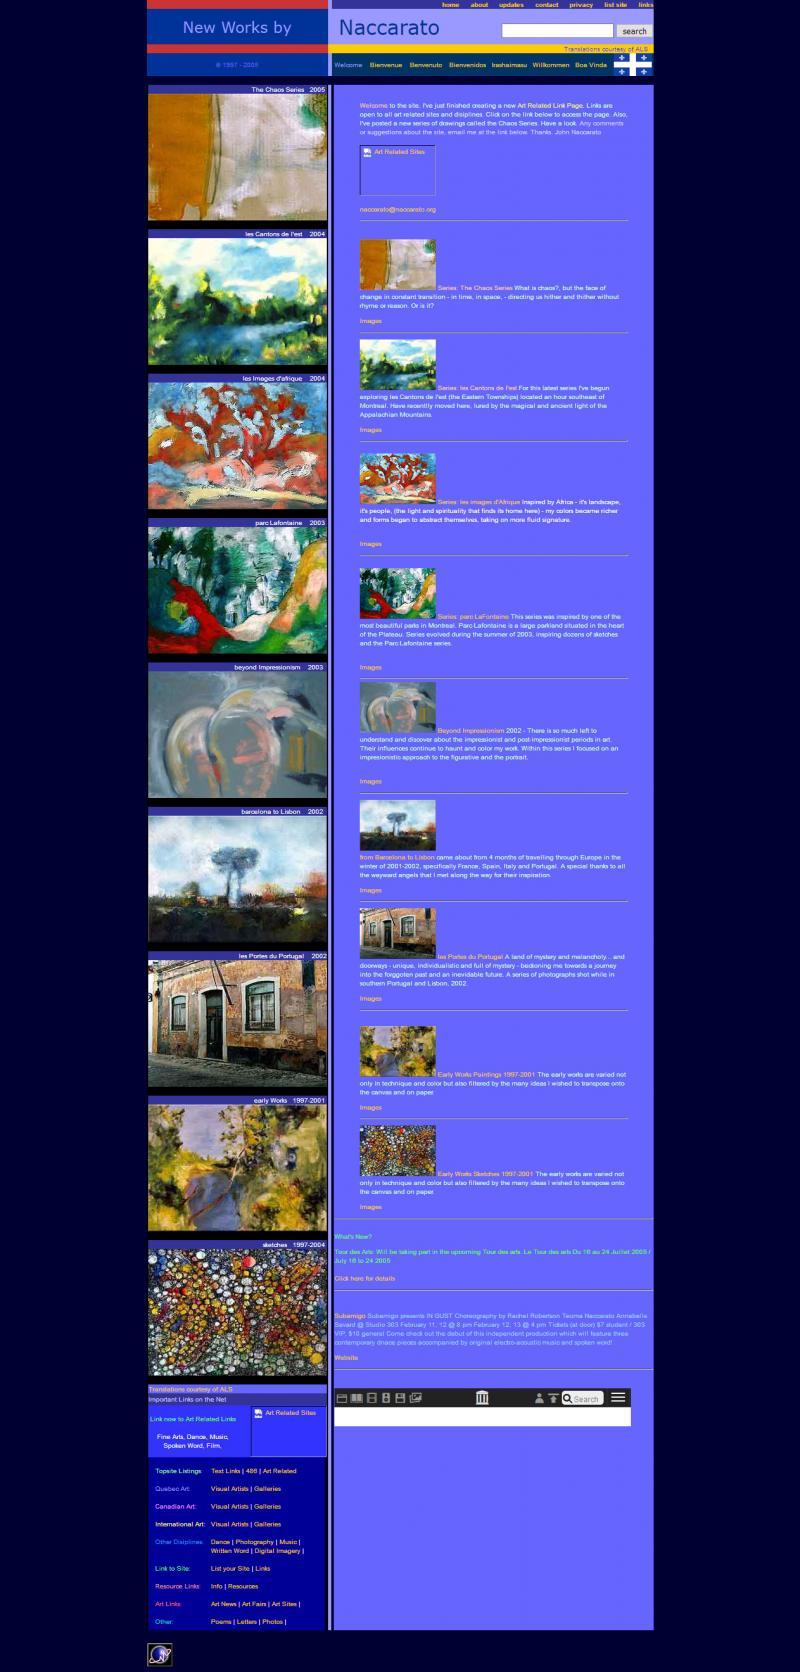 Naccarato.org Website, Wayback Machine, Internet Archive, February, 2005